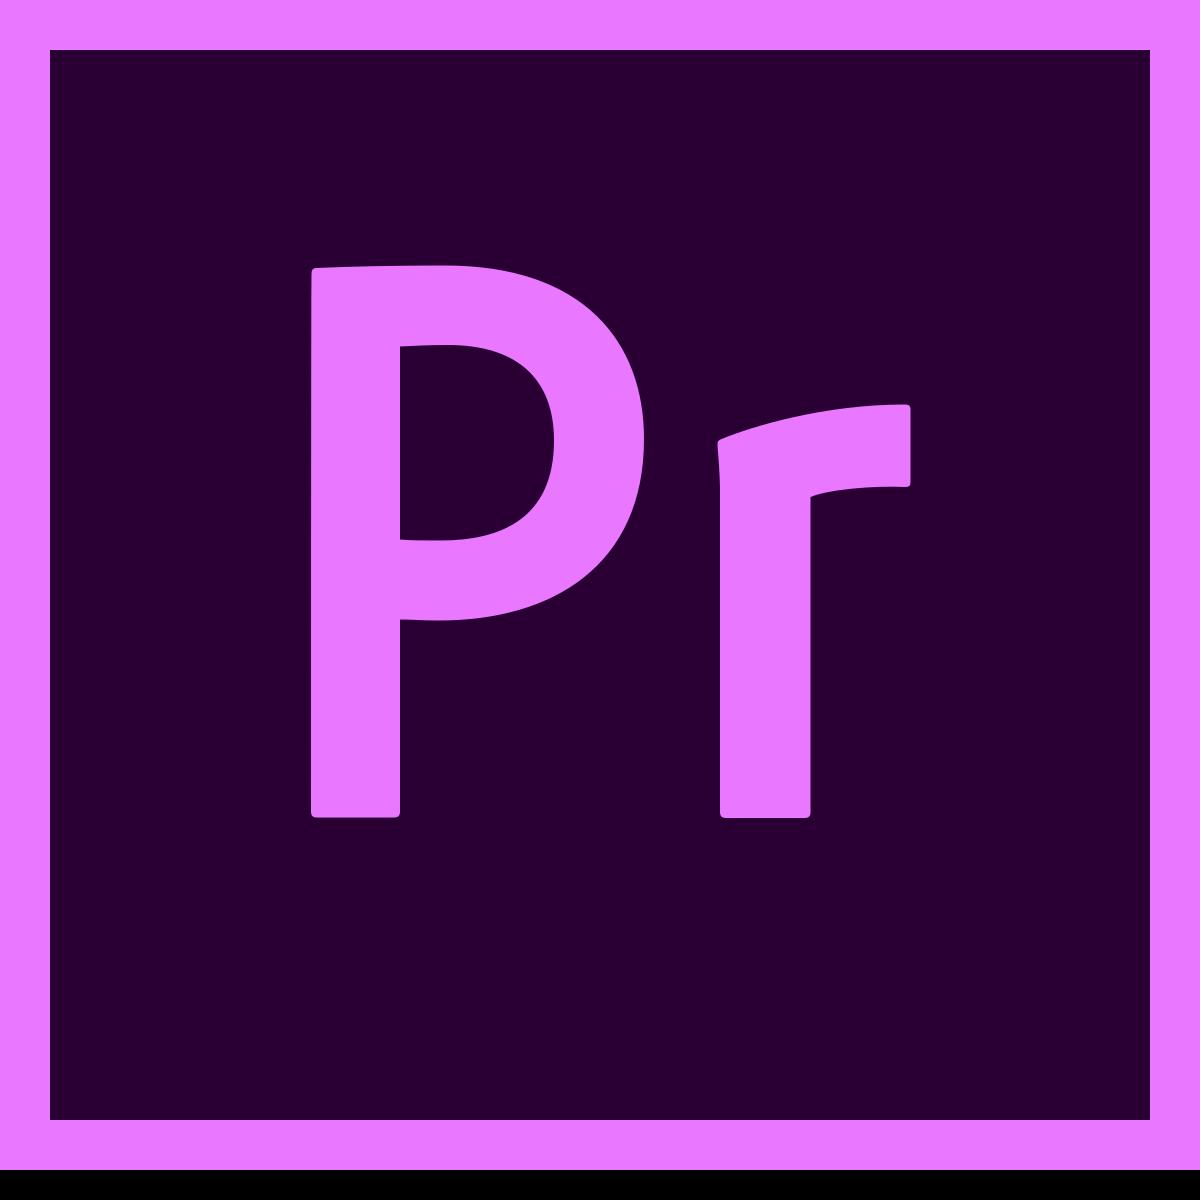 File:Adobe Premiere Pro Logo.svg.